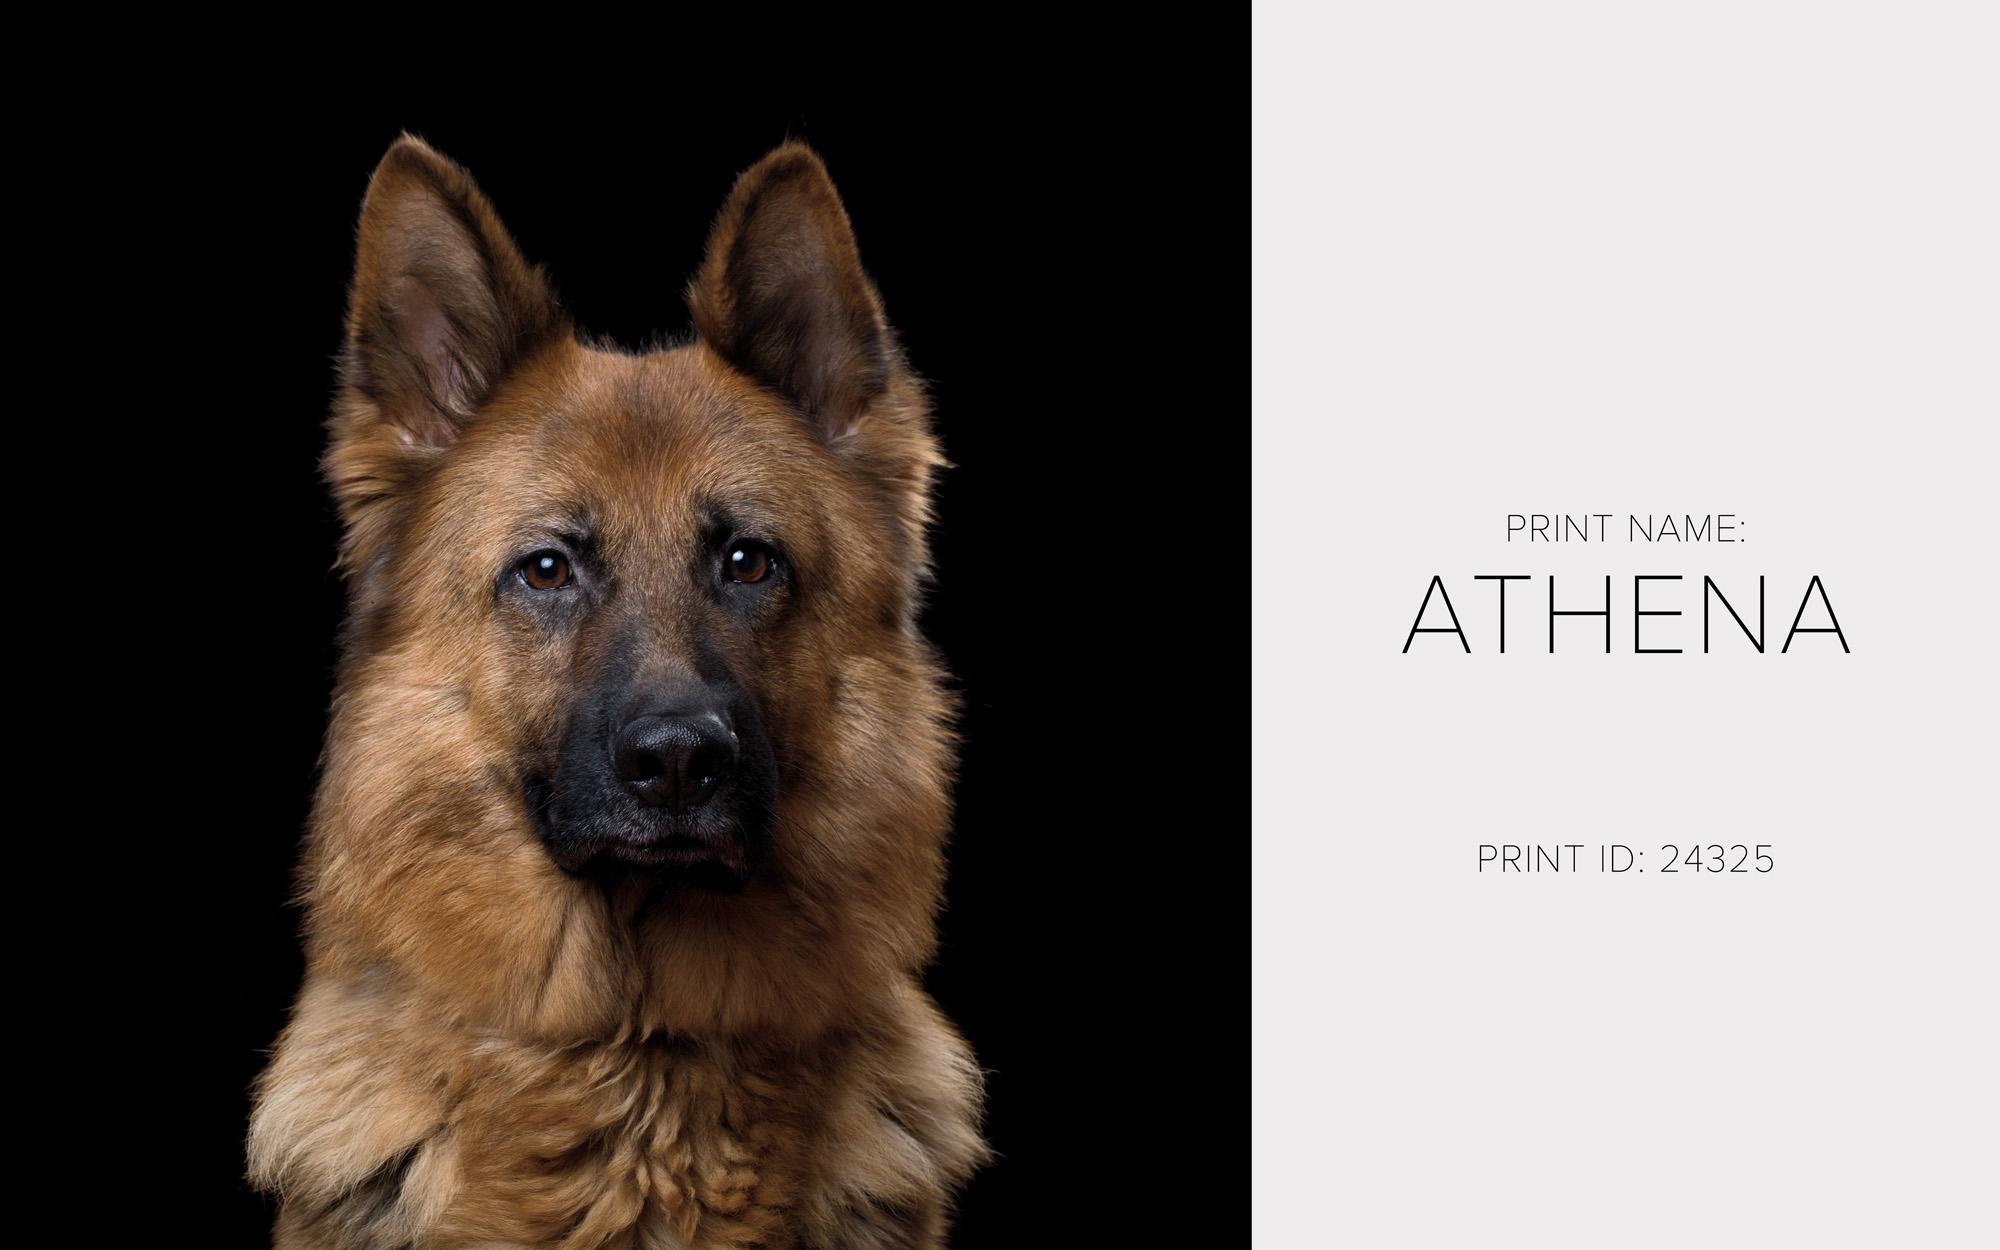 Athena_Print.jpg